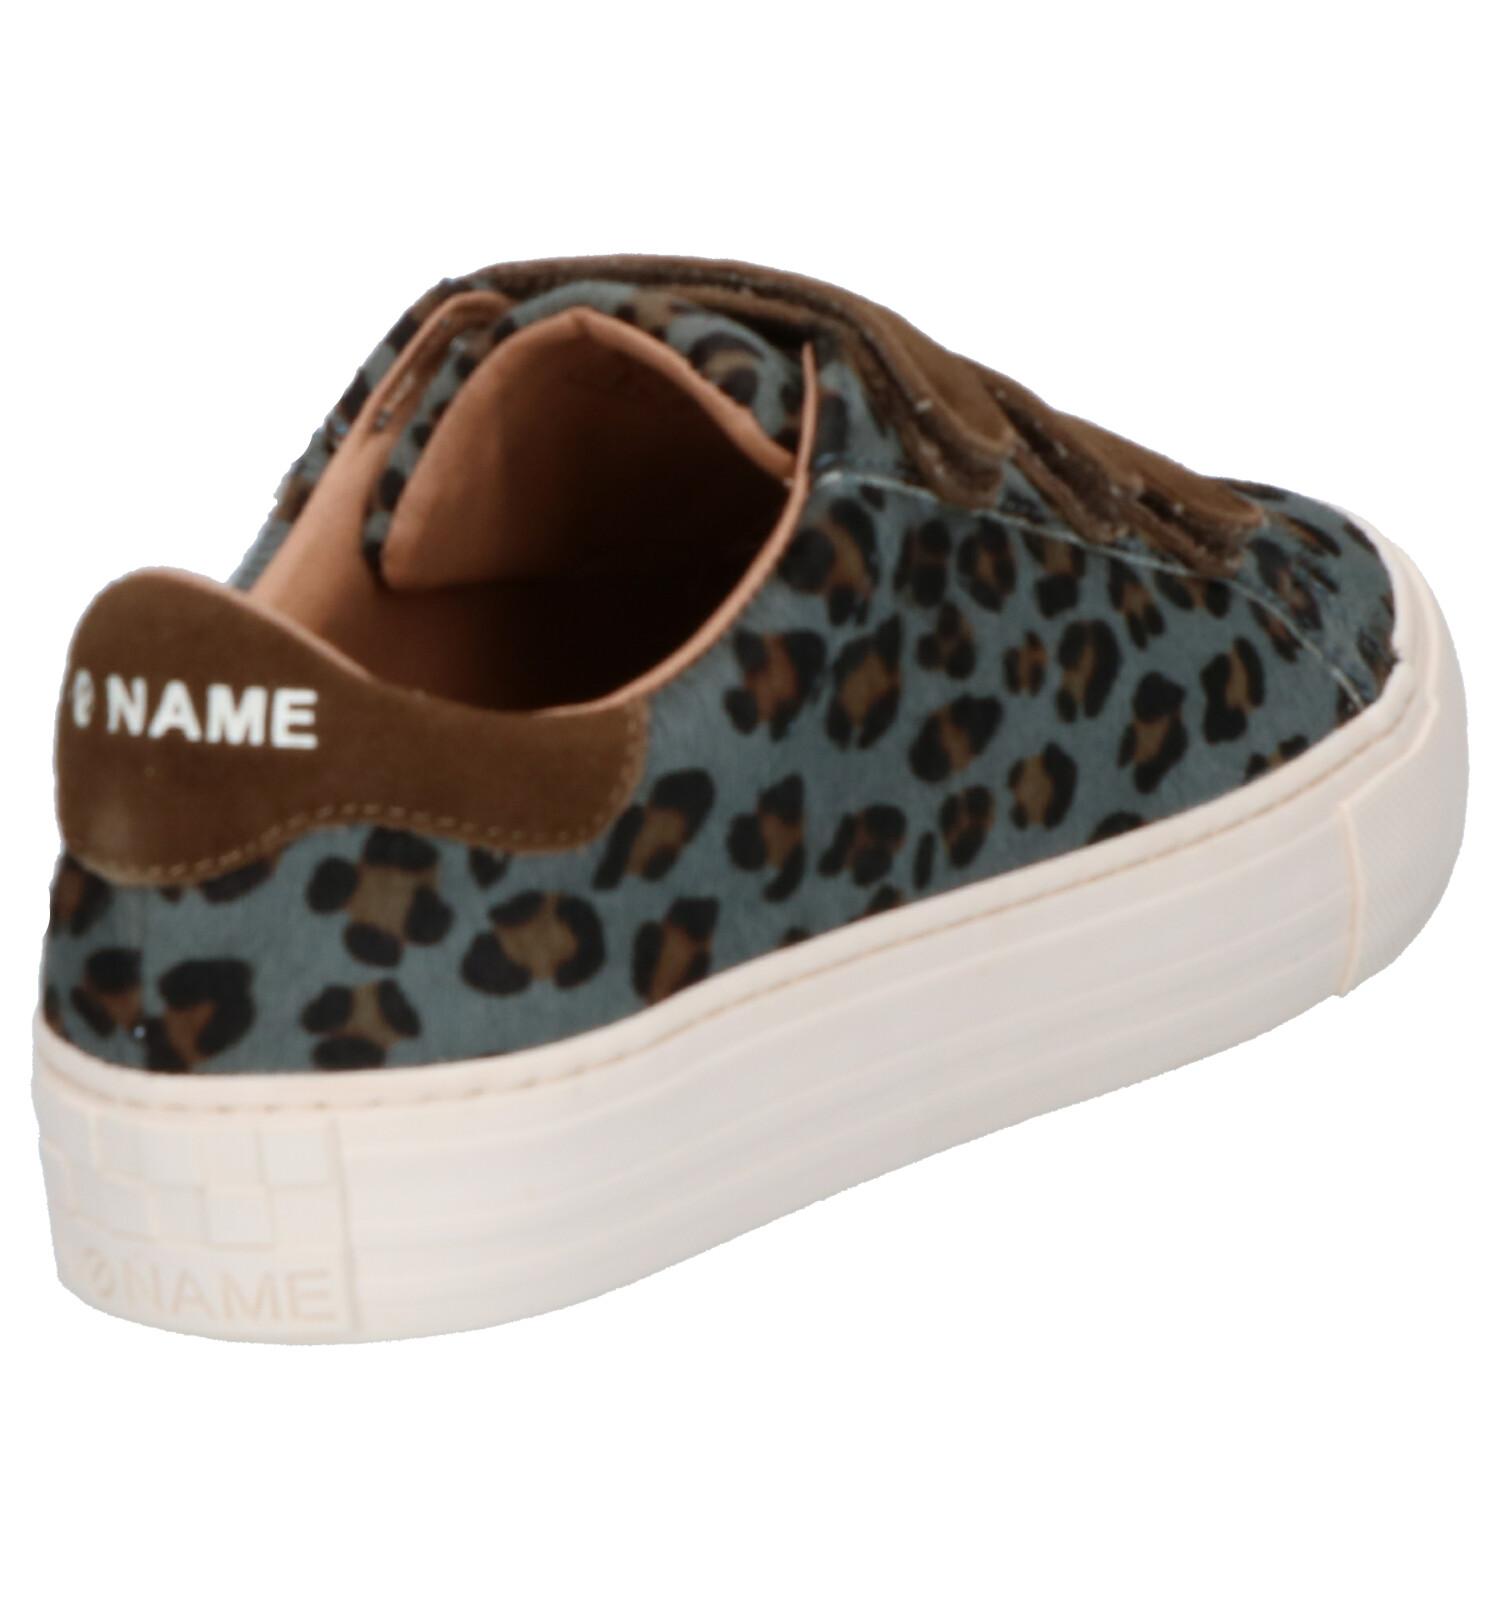 Blauwe Sneakers No Name Arcade LqzSUVpGM